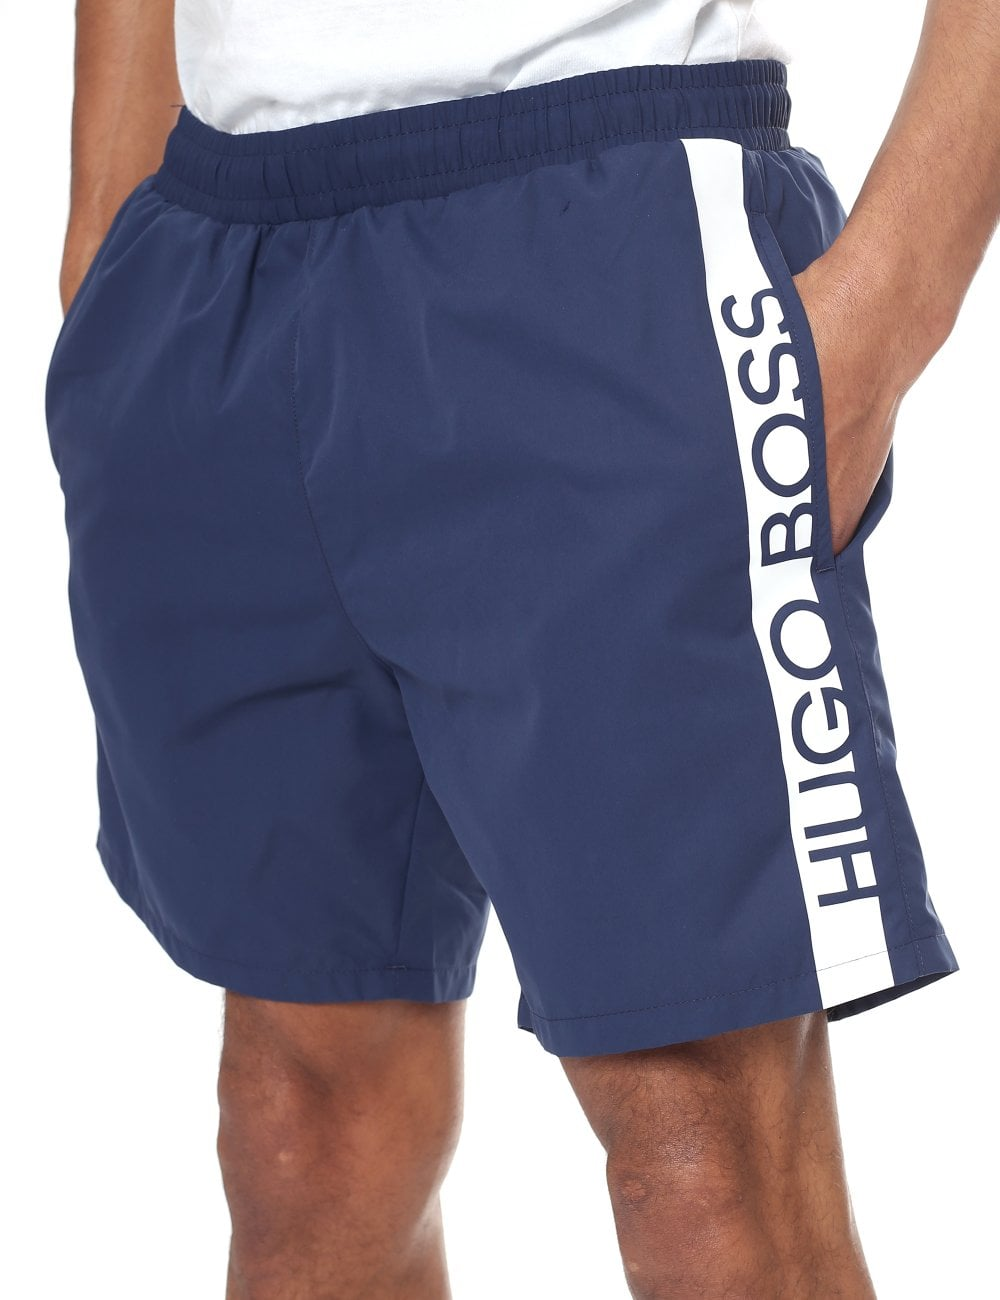 8dae6bf97 ... Boss Bodywear 'Dolphin' Logo Print Swim Shorts. Tap image to zoom.  'Dolphin' ...